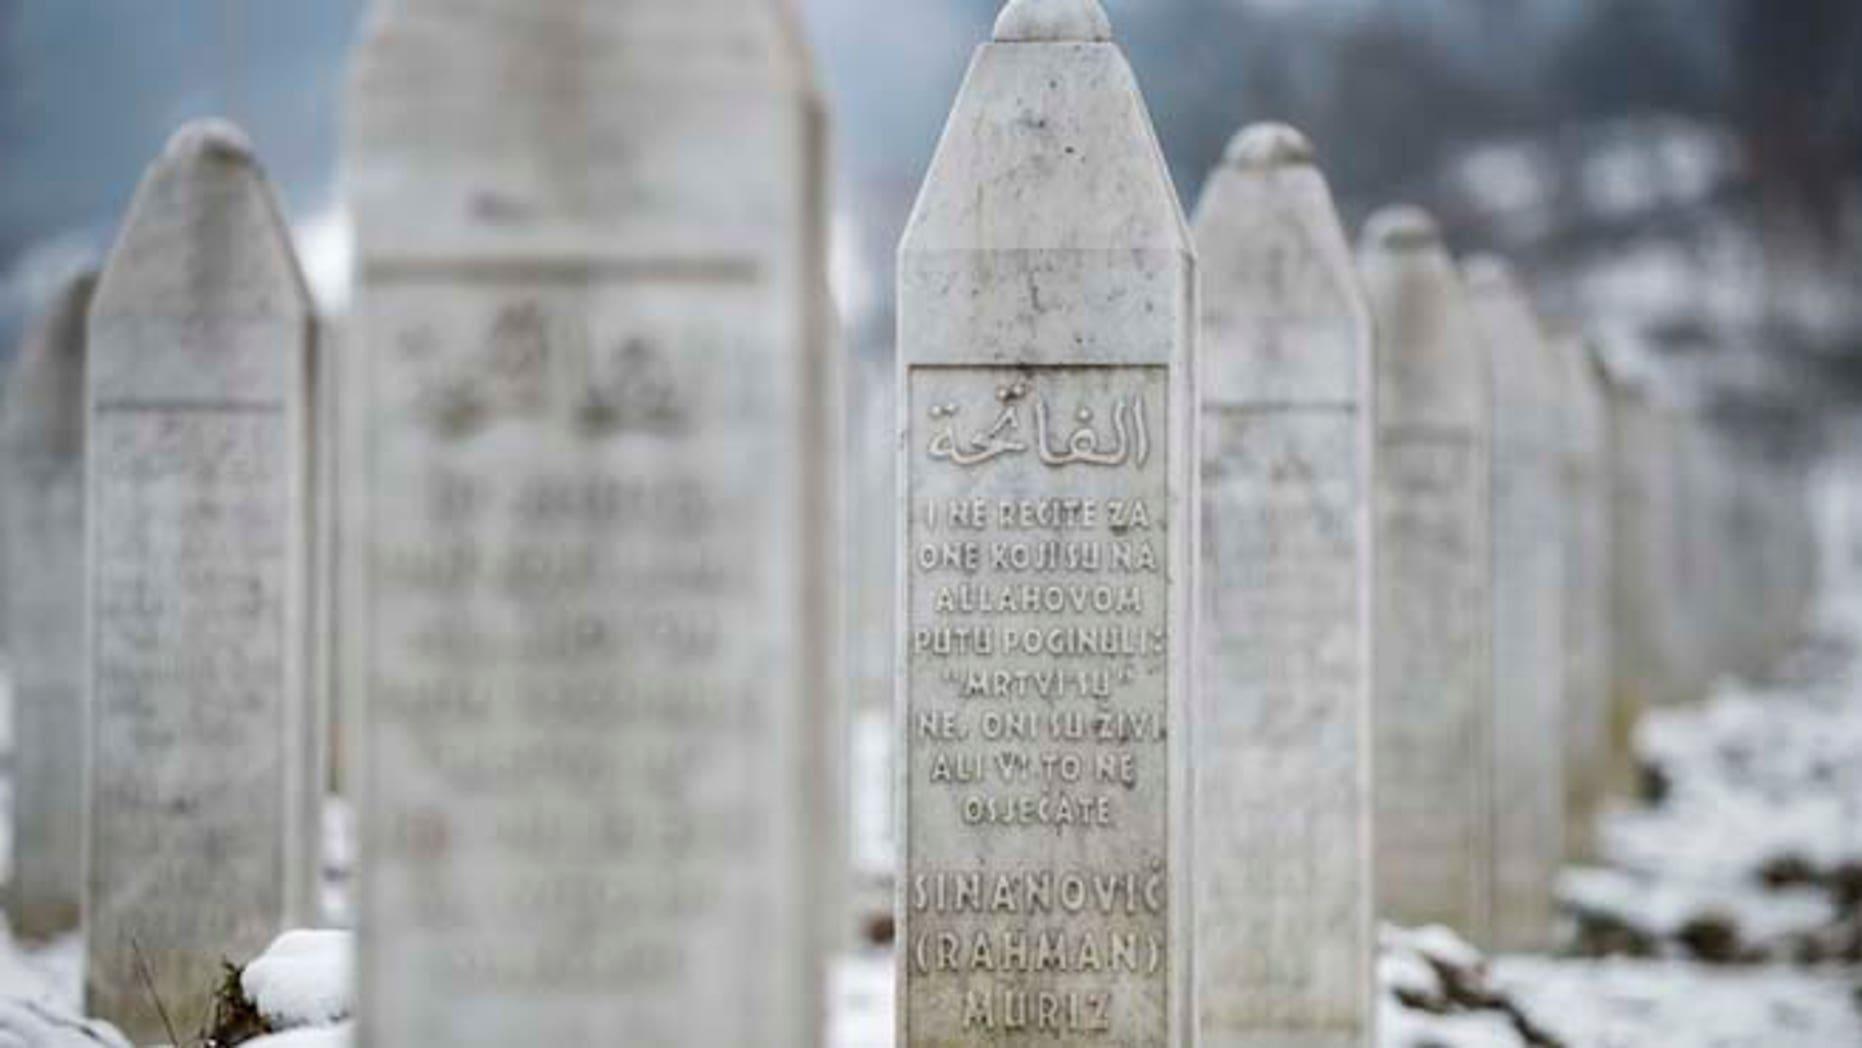 Saturday, March 7, 2015: This photo taken in the memorial cemetery Potocari, outside Srebrenica, shows the gravestone of Muriz Sinanovic. Sinanovic was among the 8,000 Muslim Bosniak men and boys killed in July 1995 Srebrenica massacre.